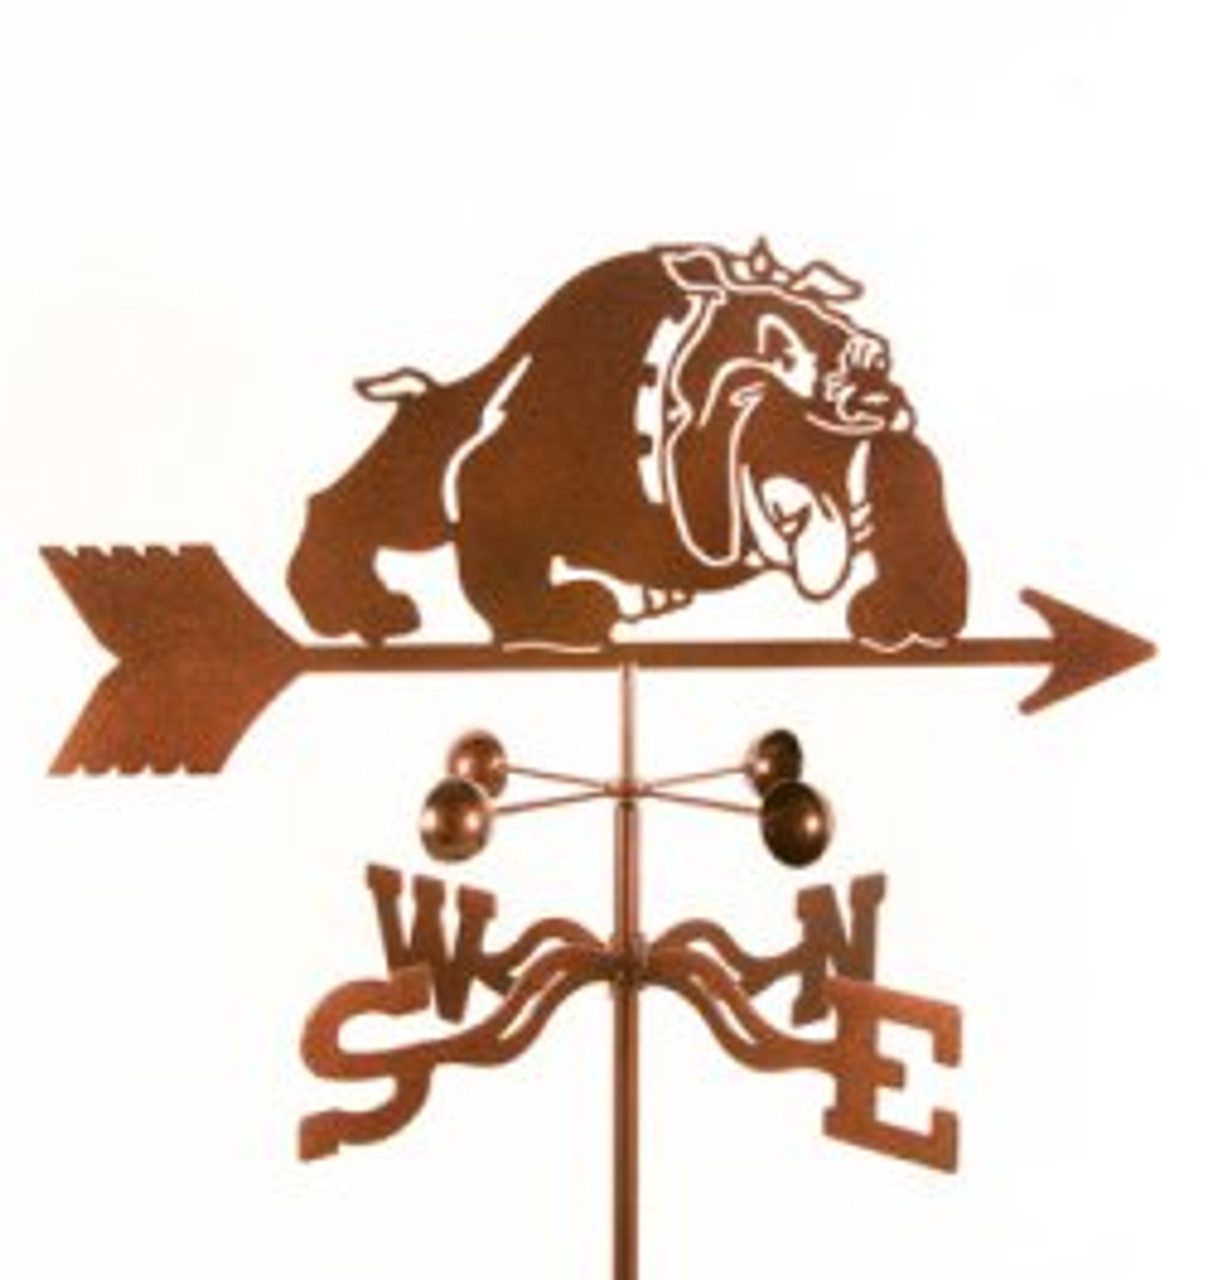 Dog-Bulldog  Weathervane with mount